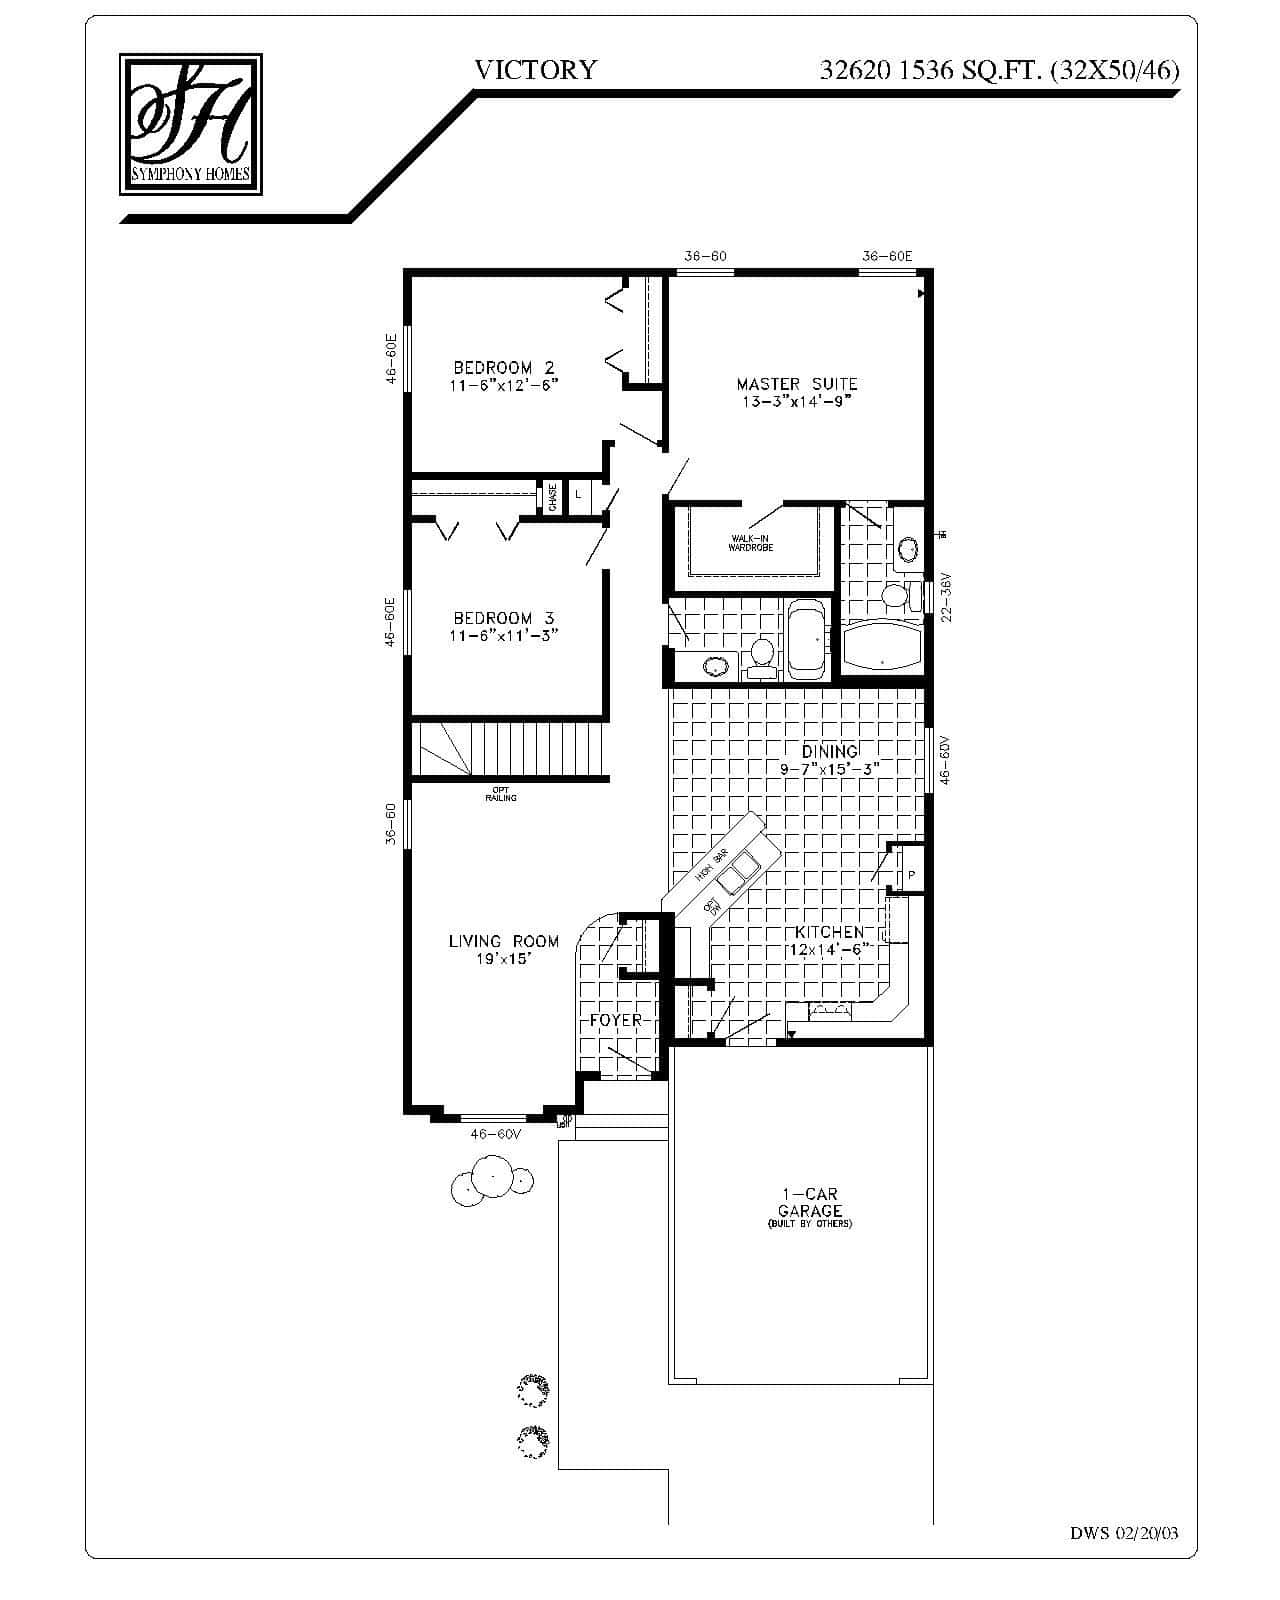 28 symphony homes floor plans symphony homes symphony homes